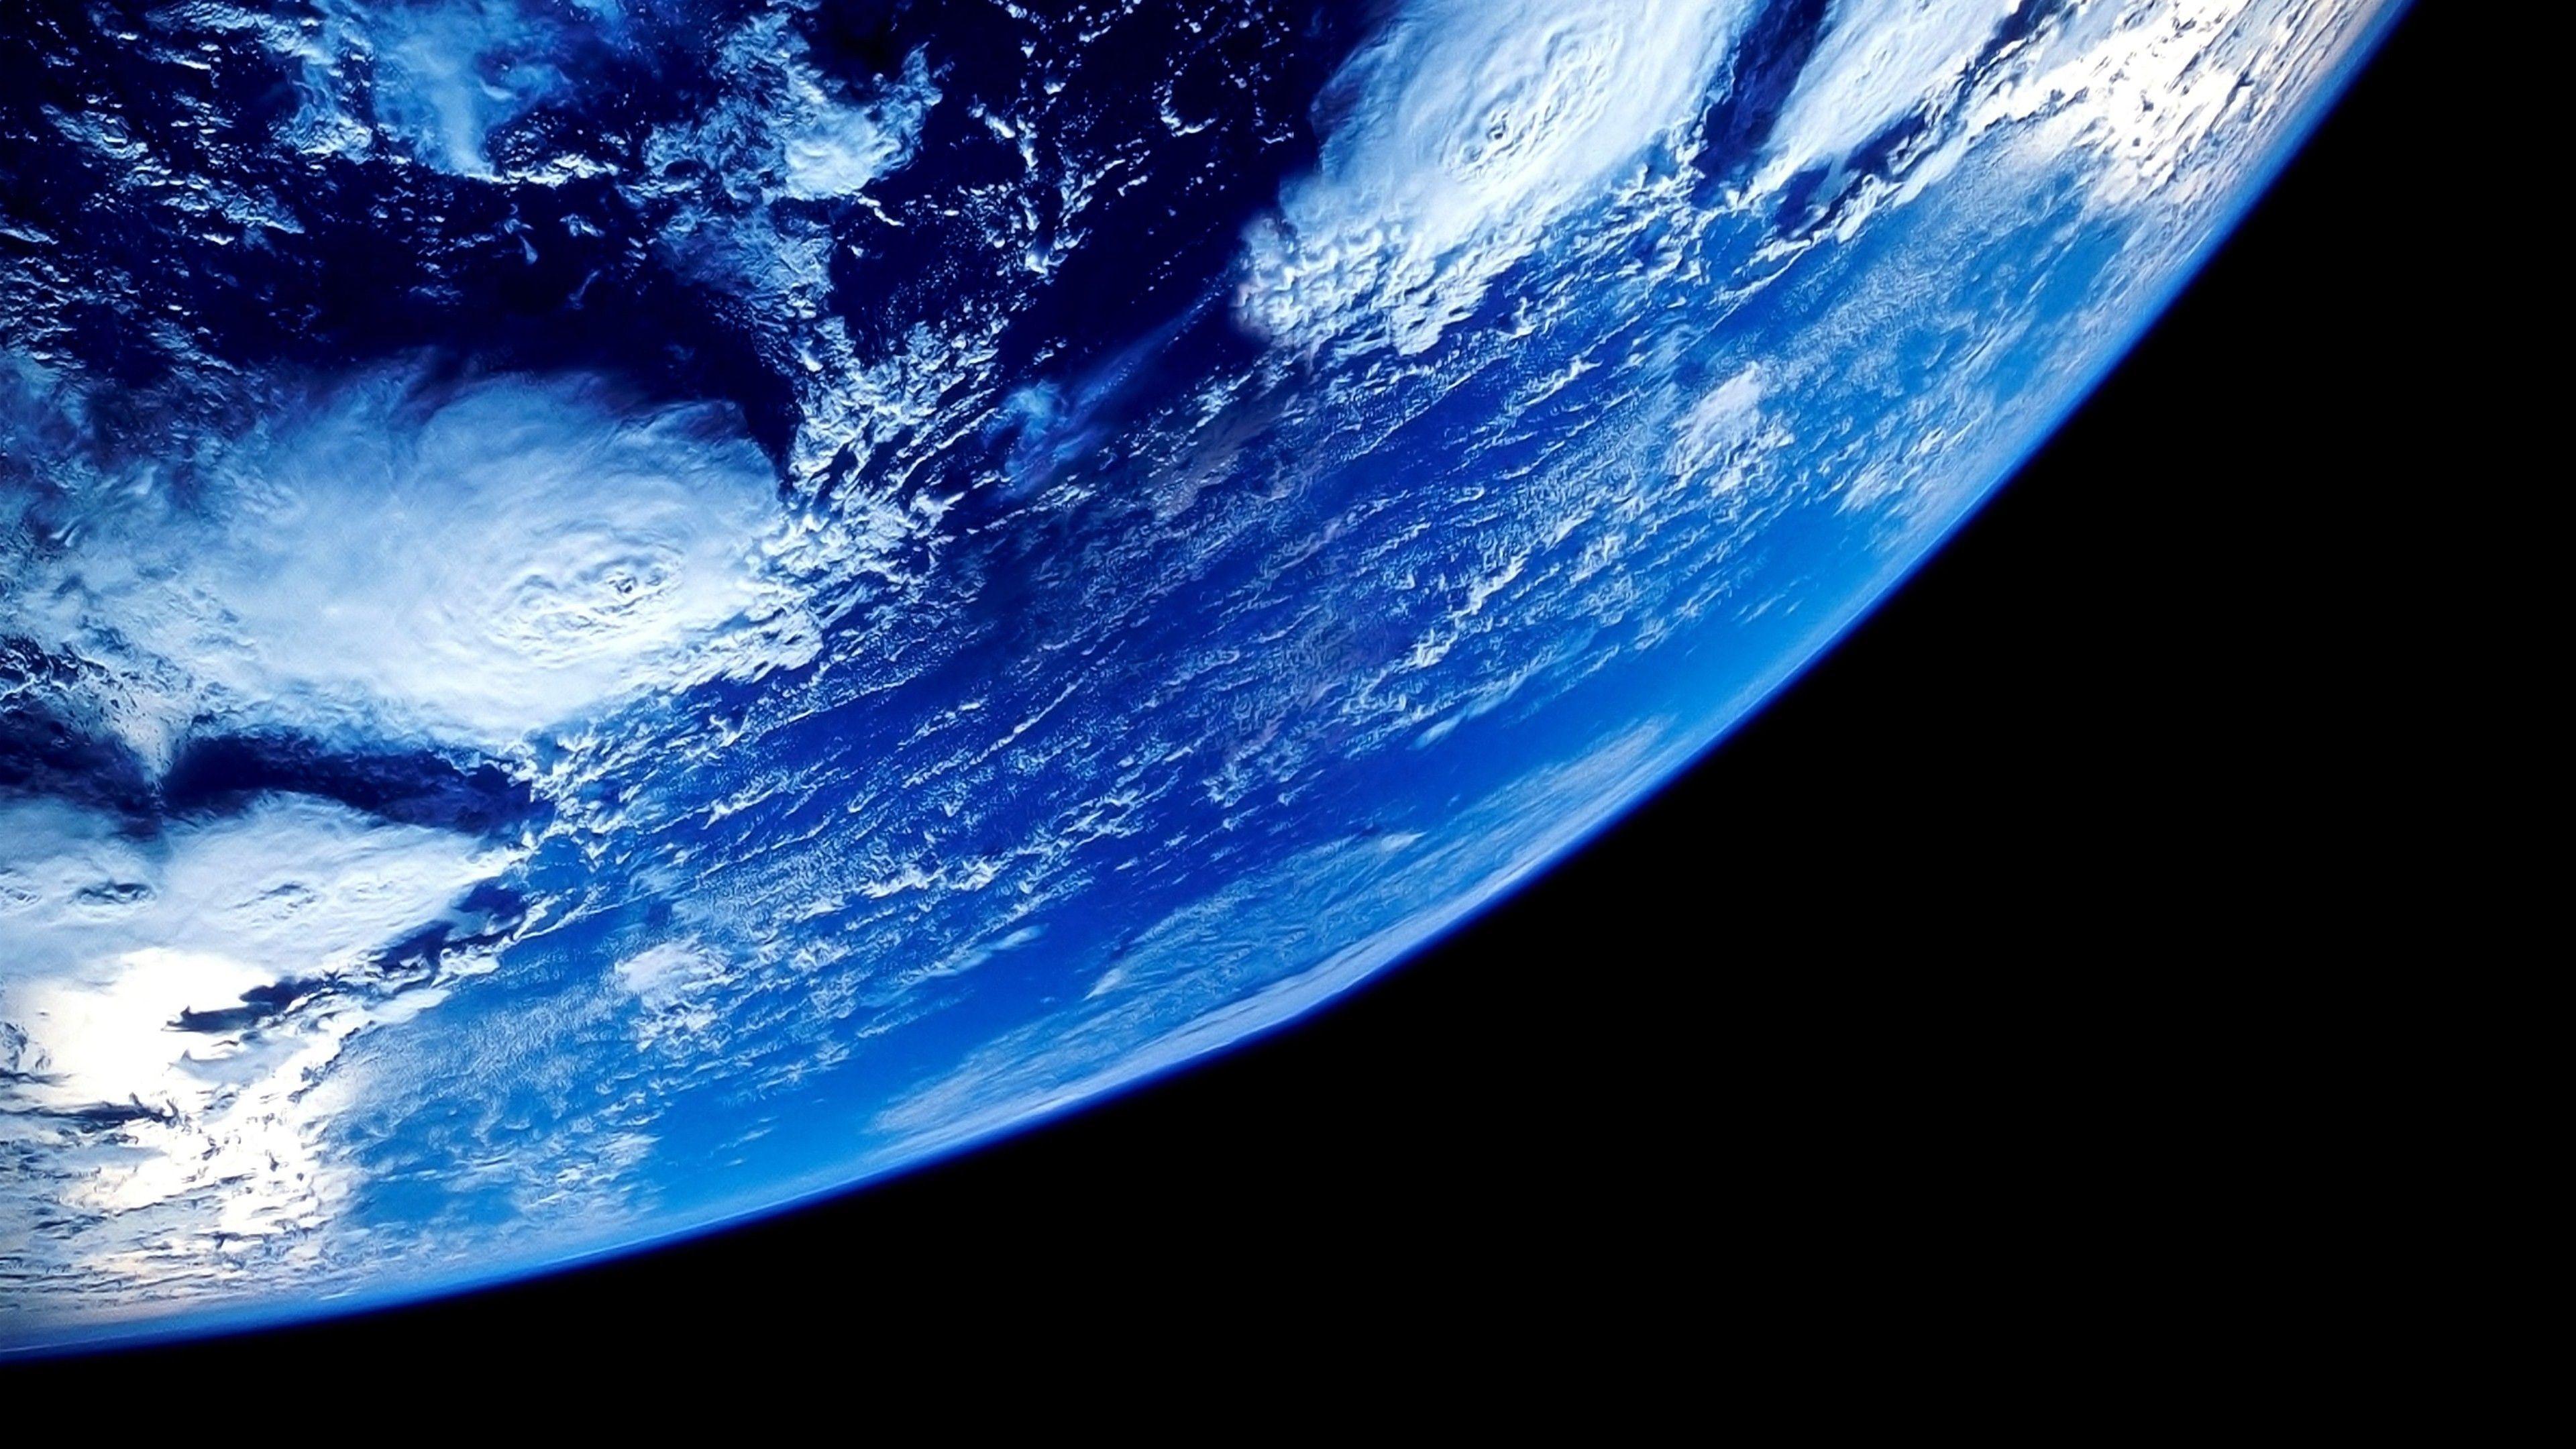 Planet Earth Wallpaper [3840 x 2160] 4K